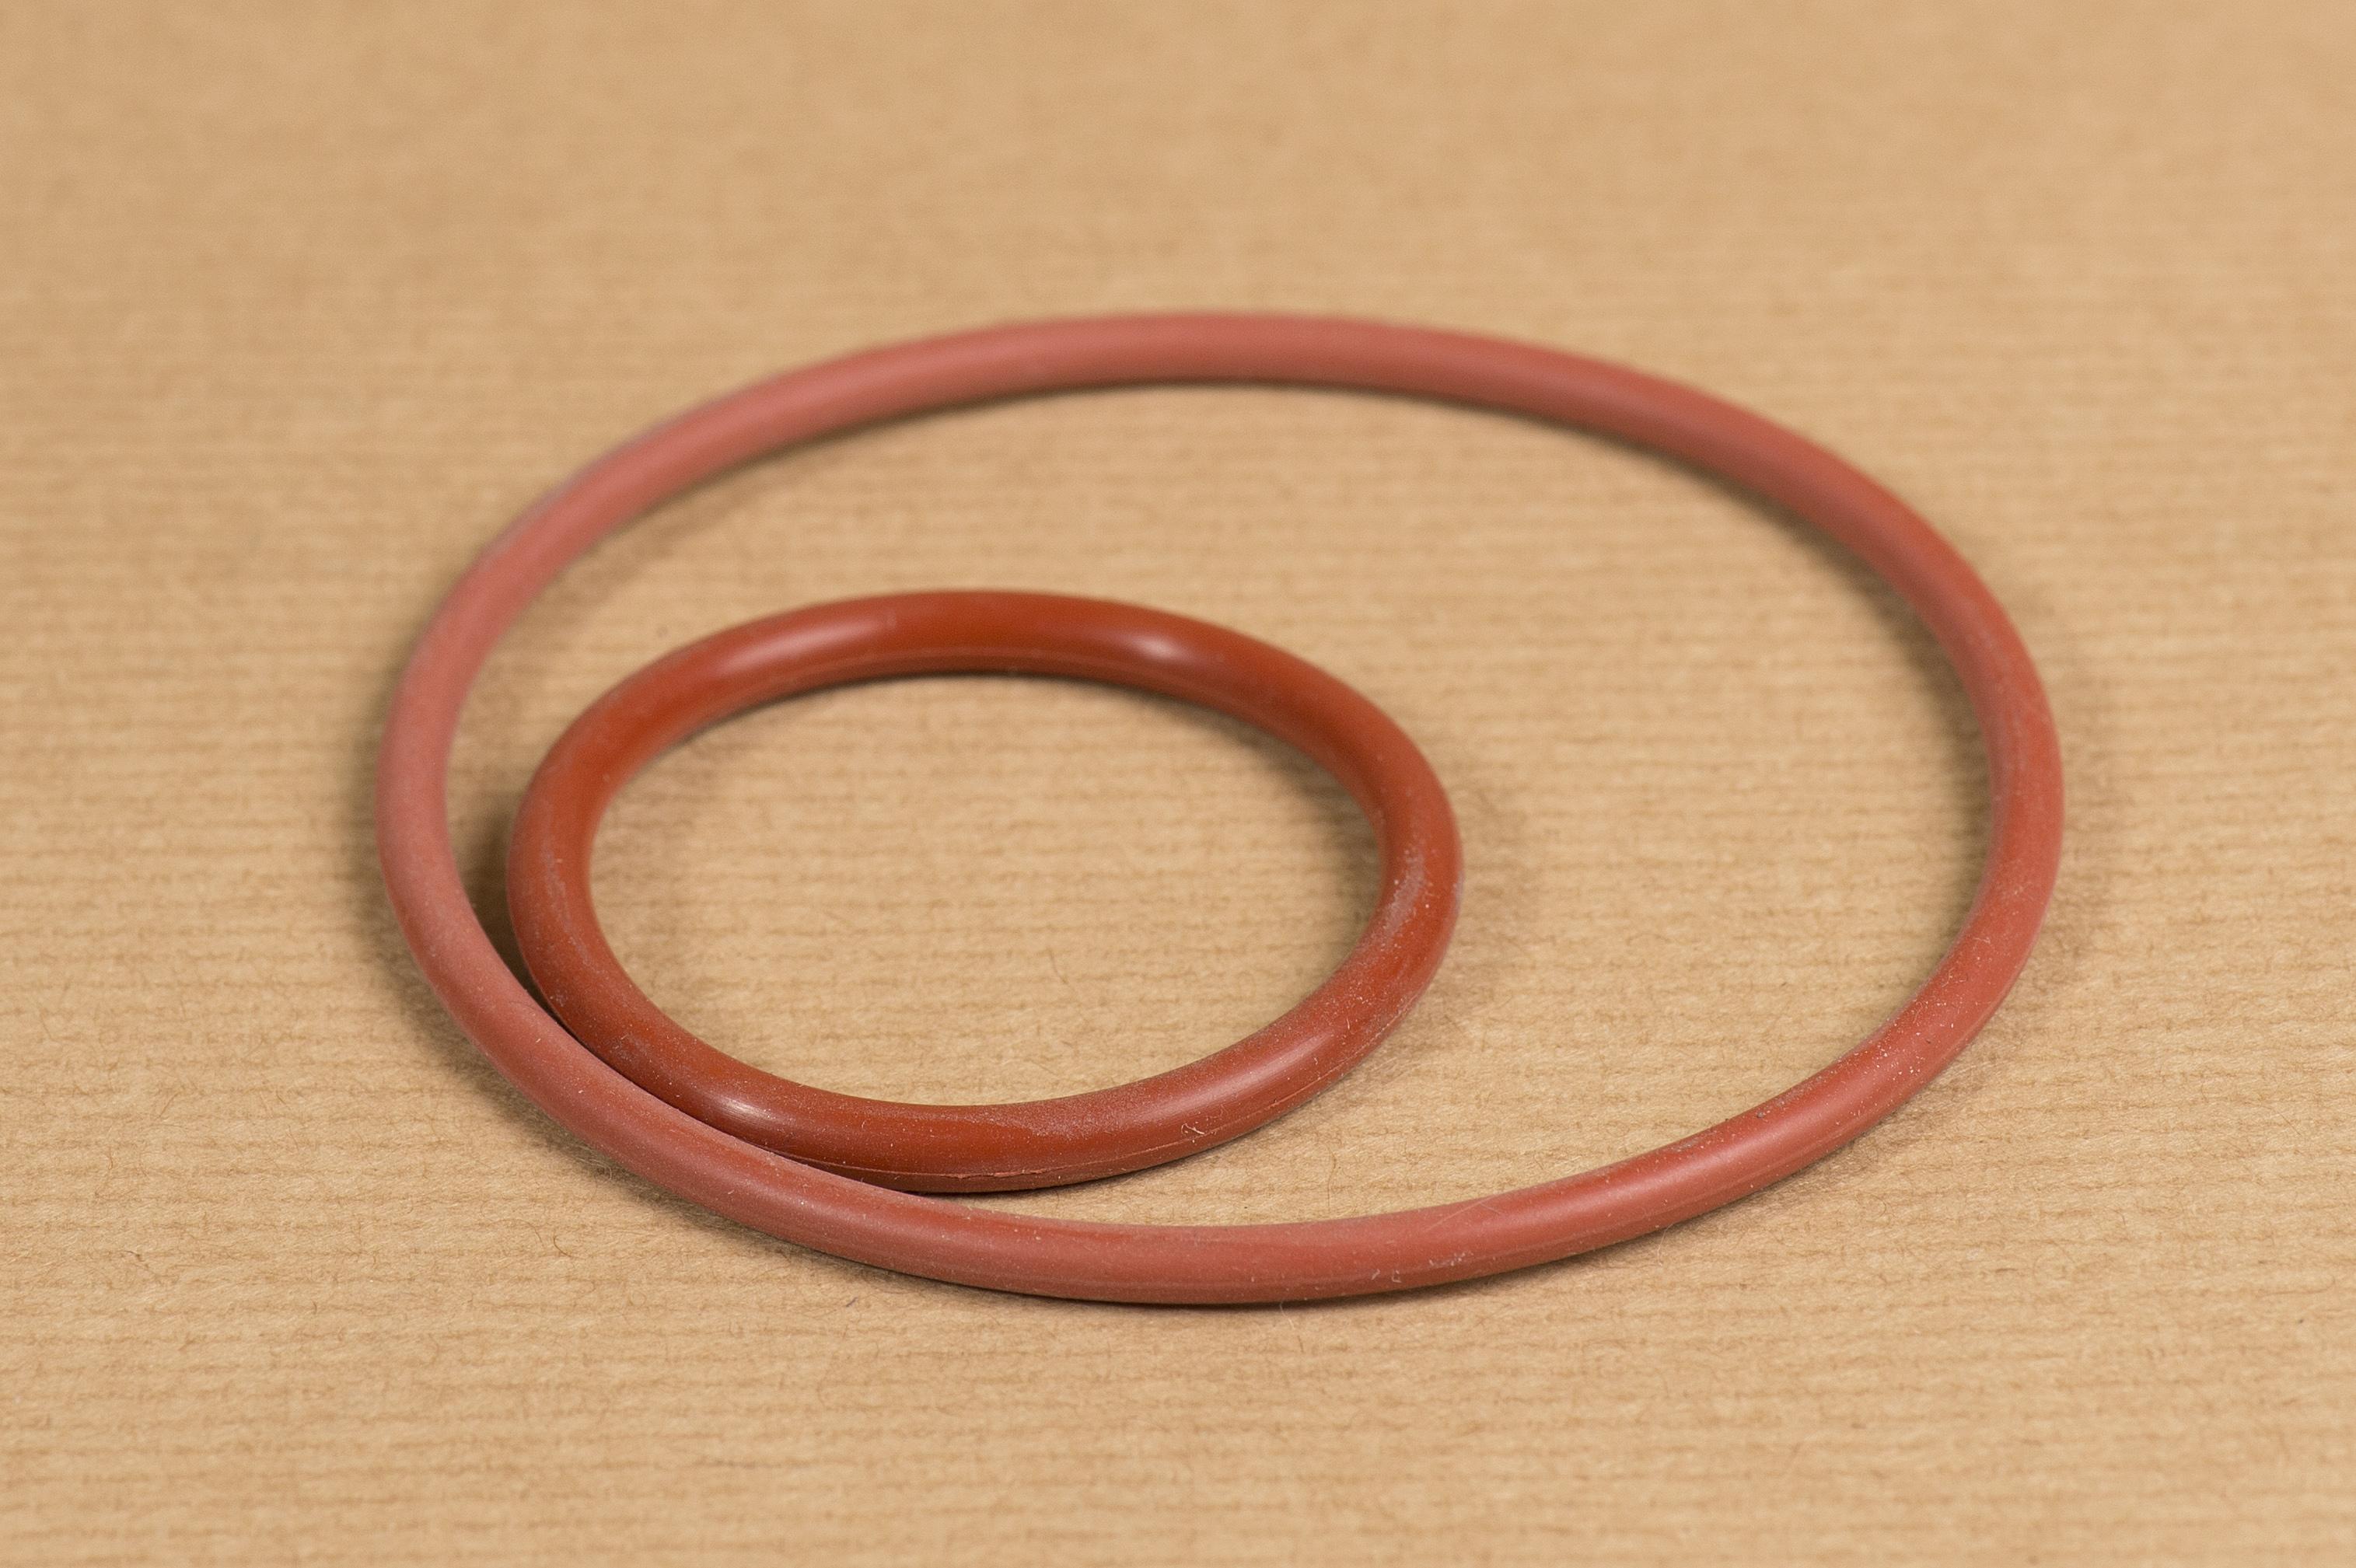 O ringe hitzebestandig